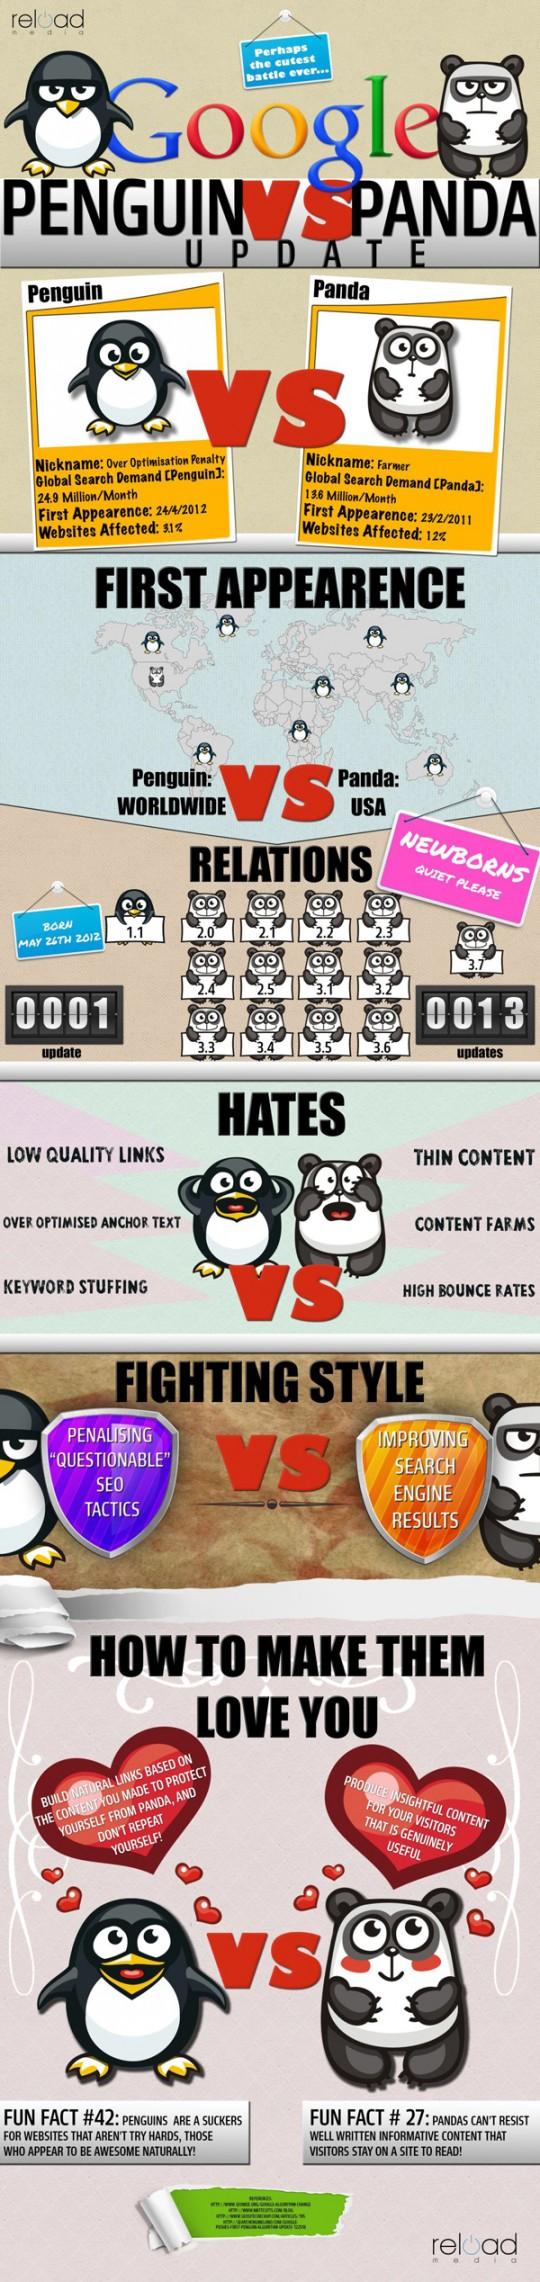 Google penguin y diferencias con Google panda (infografia)